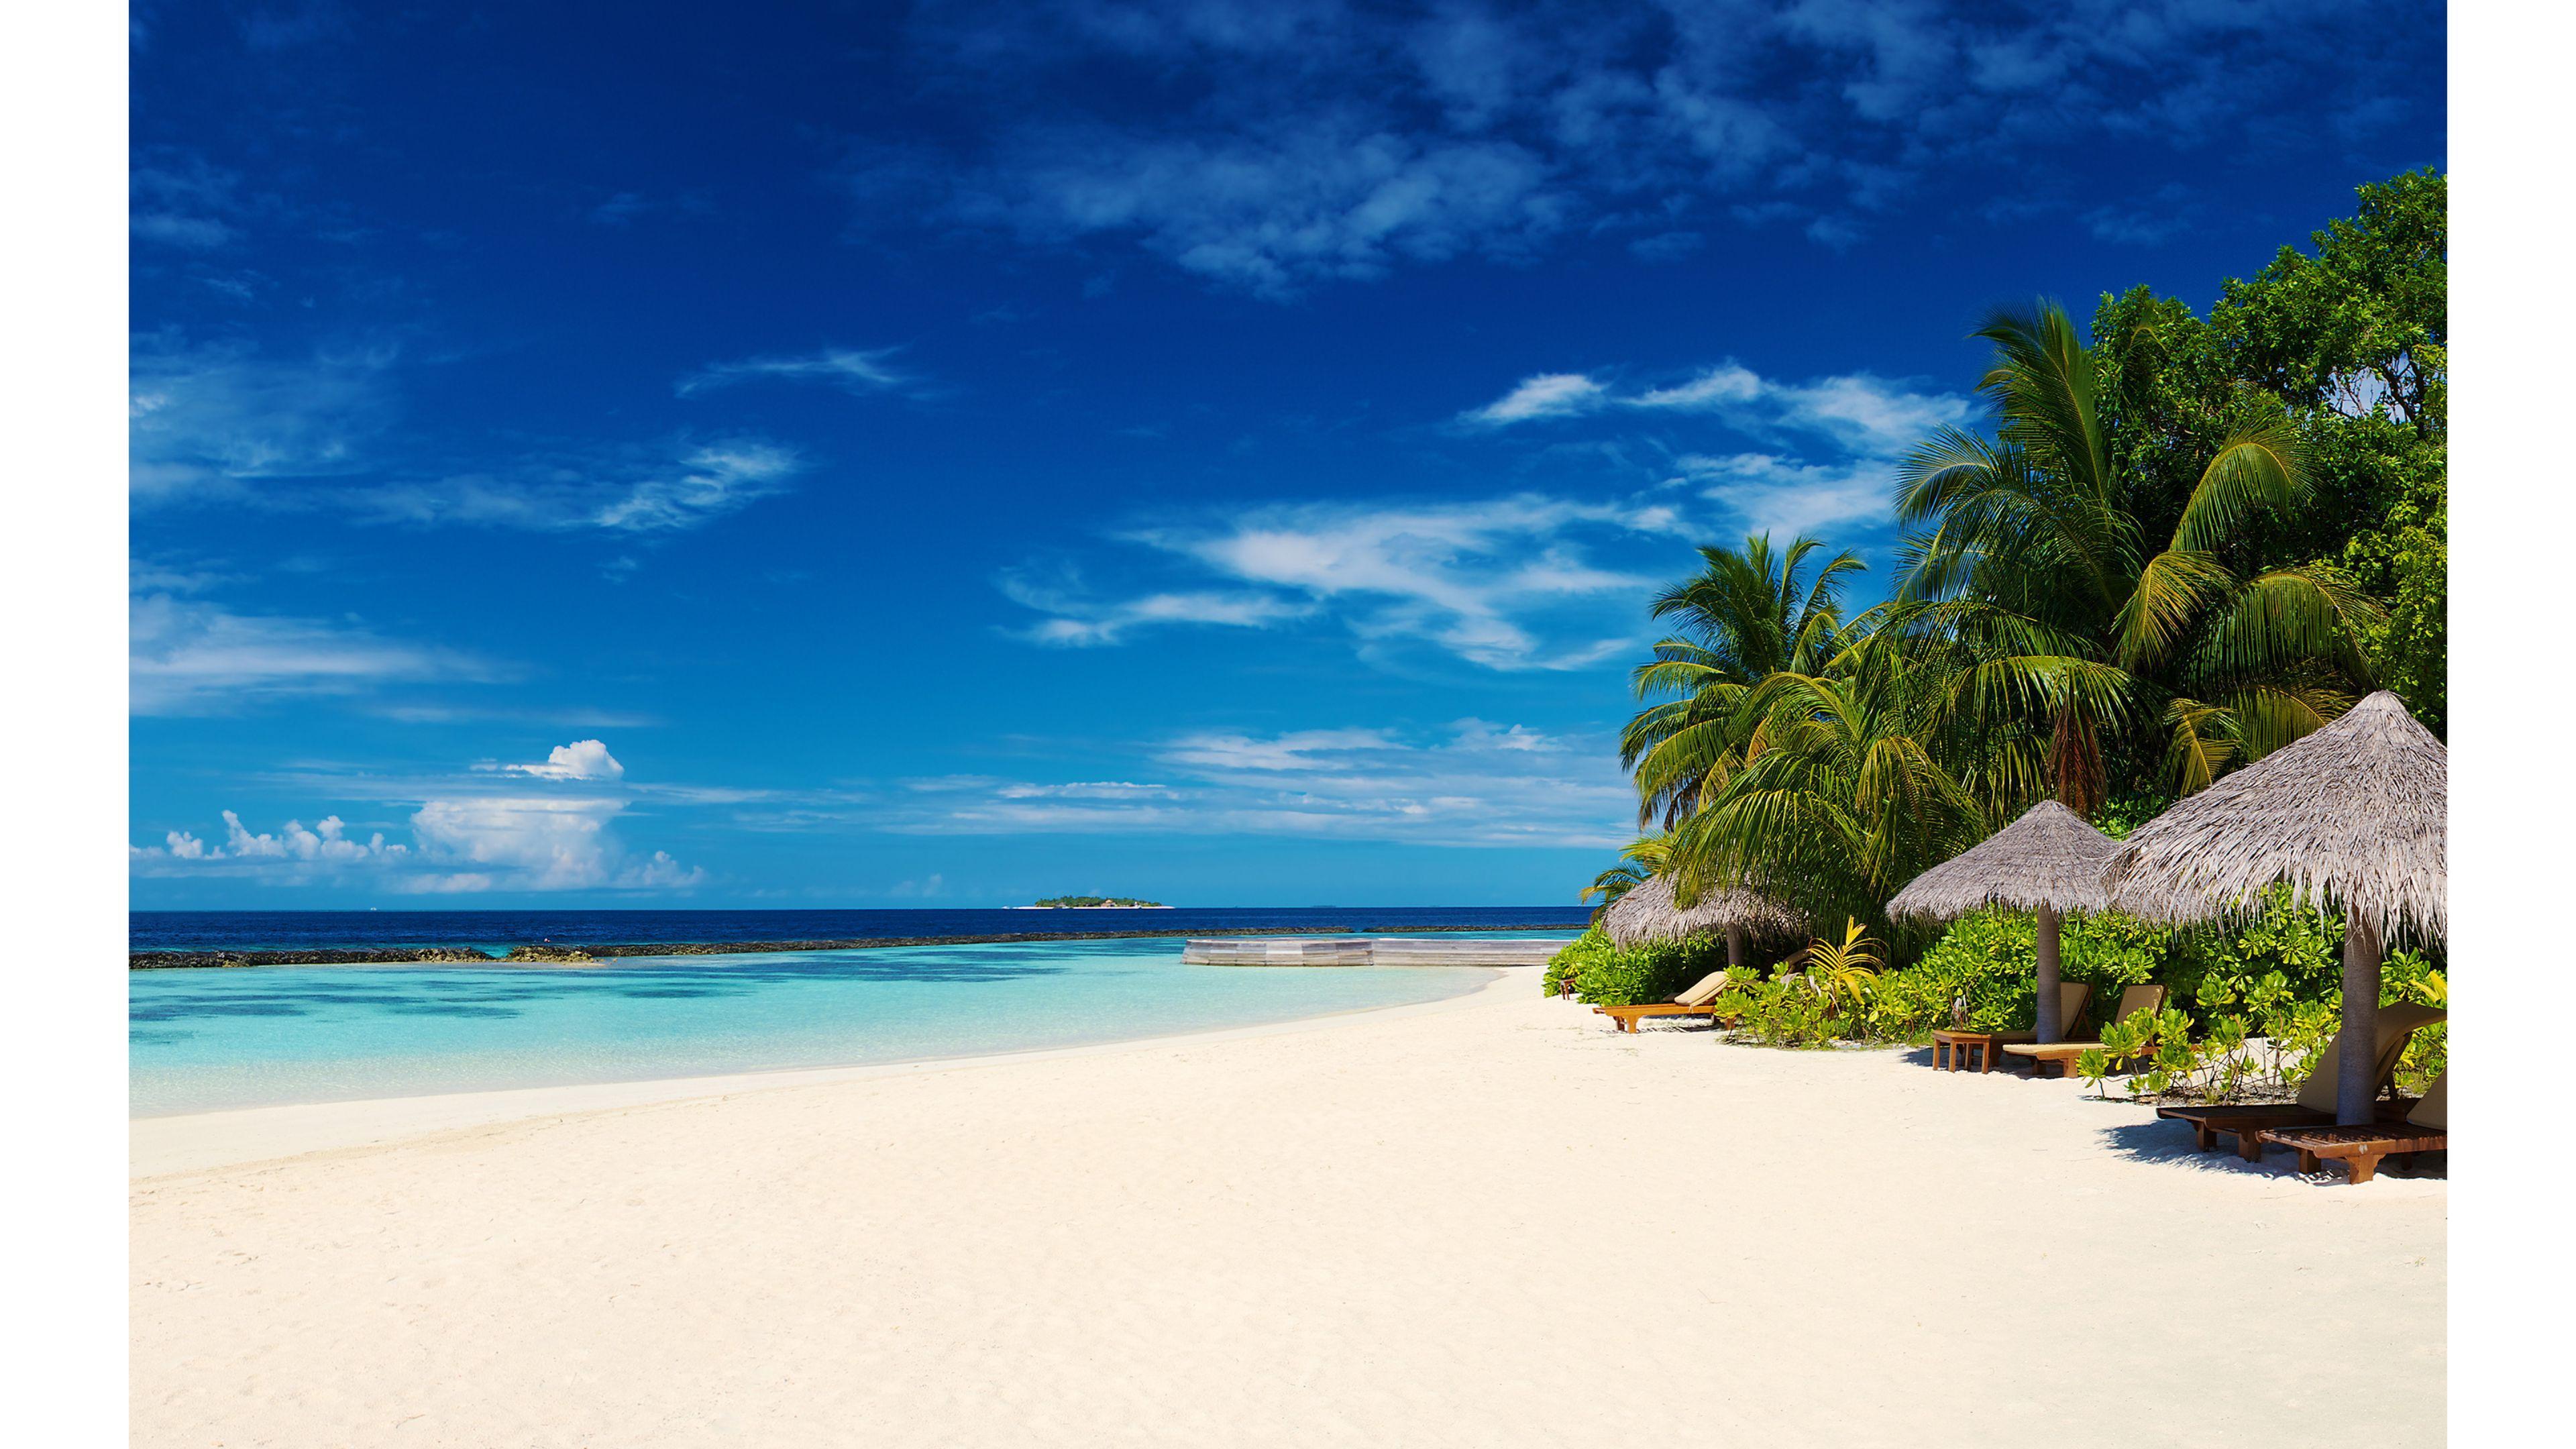 Free Caribbean Beach Wallpaper - WallpaperSafari